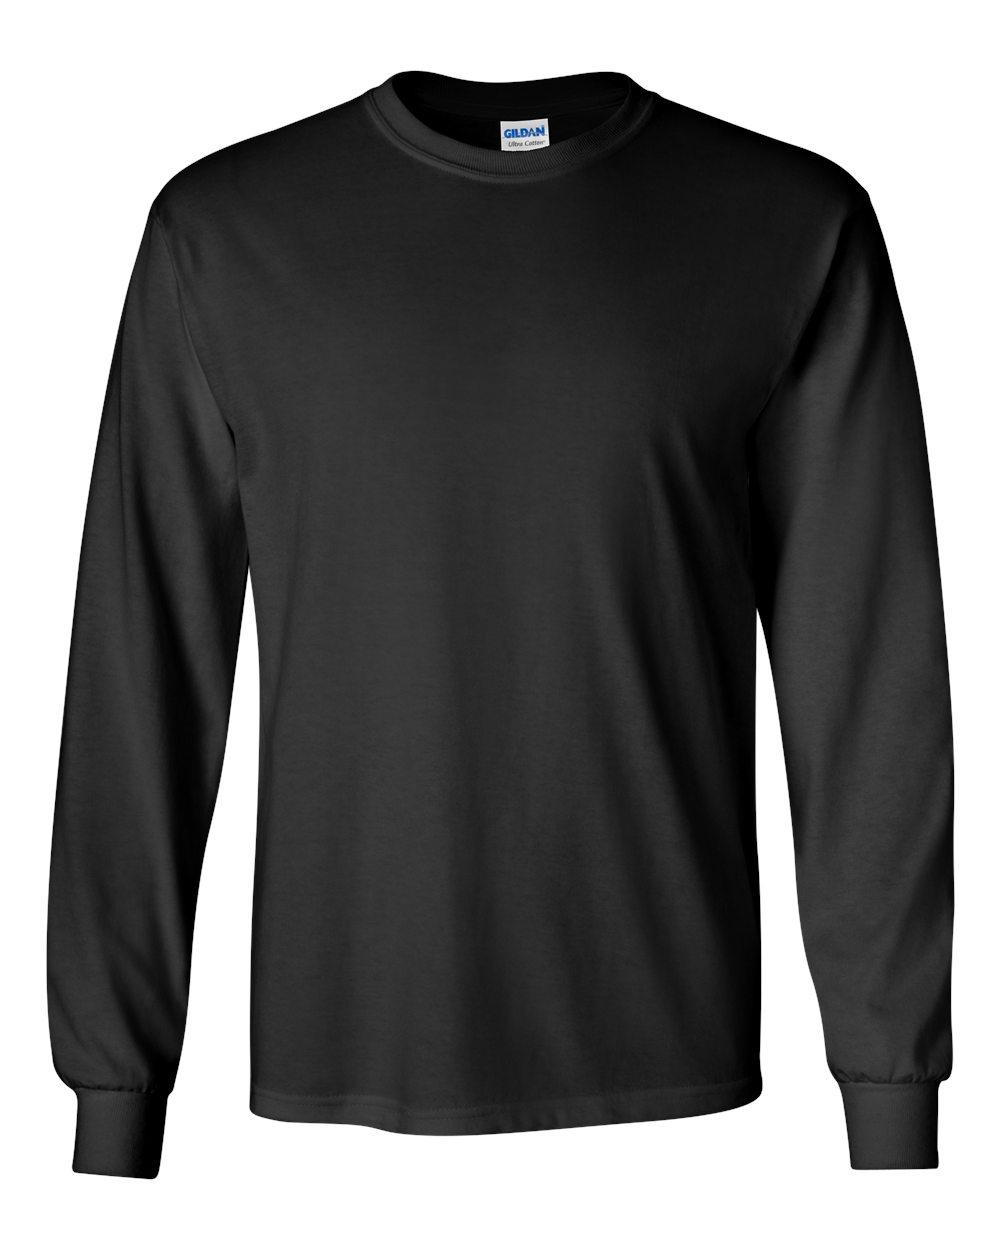 Picture of GILDAN Ultra Cotton Long Sleeve T-Shirt